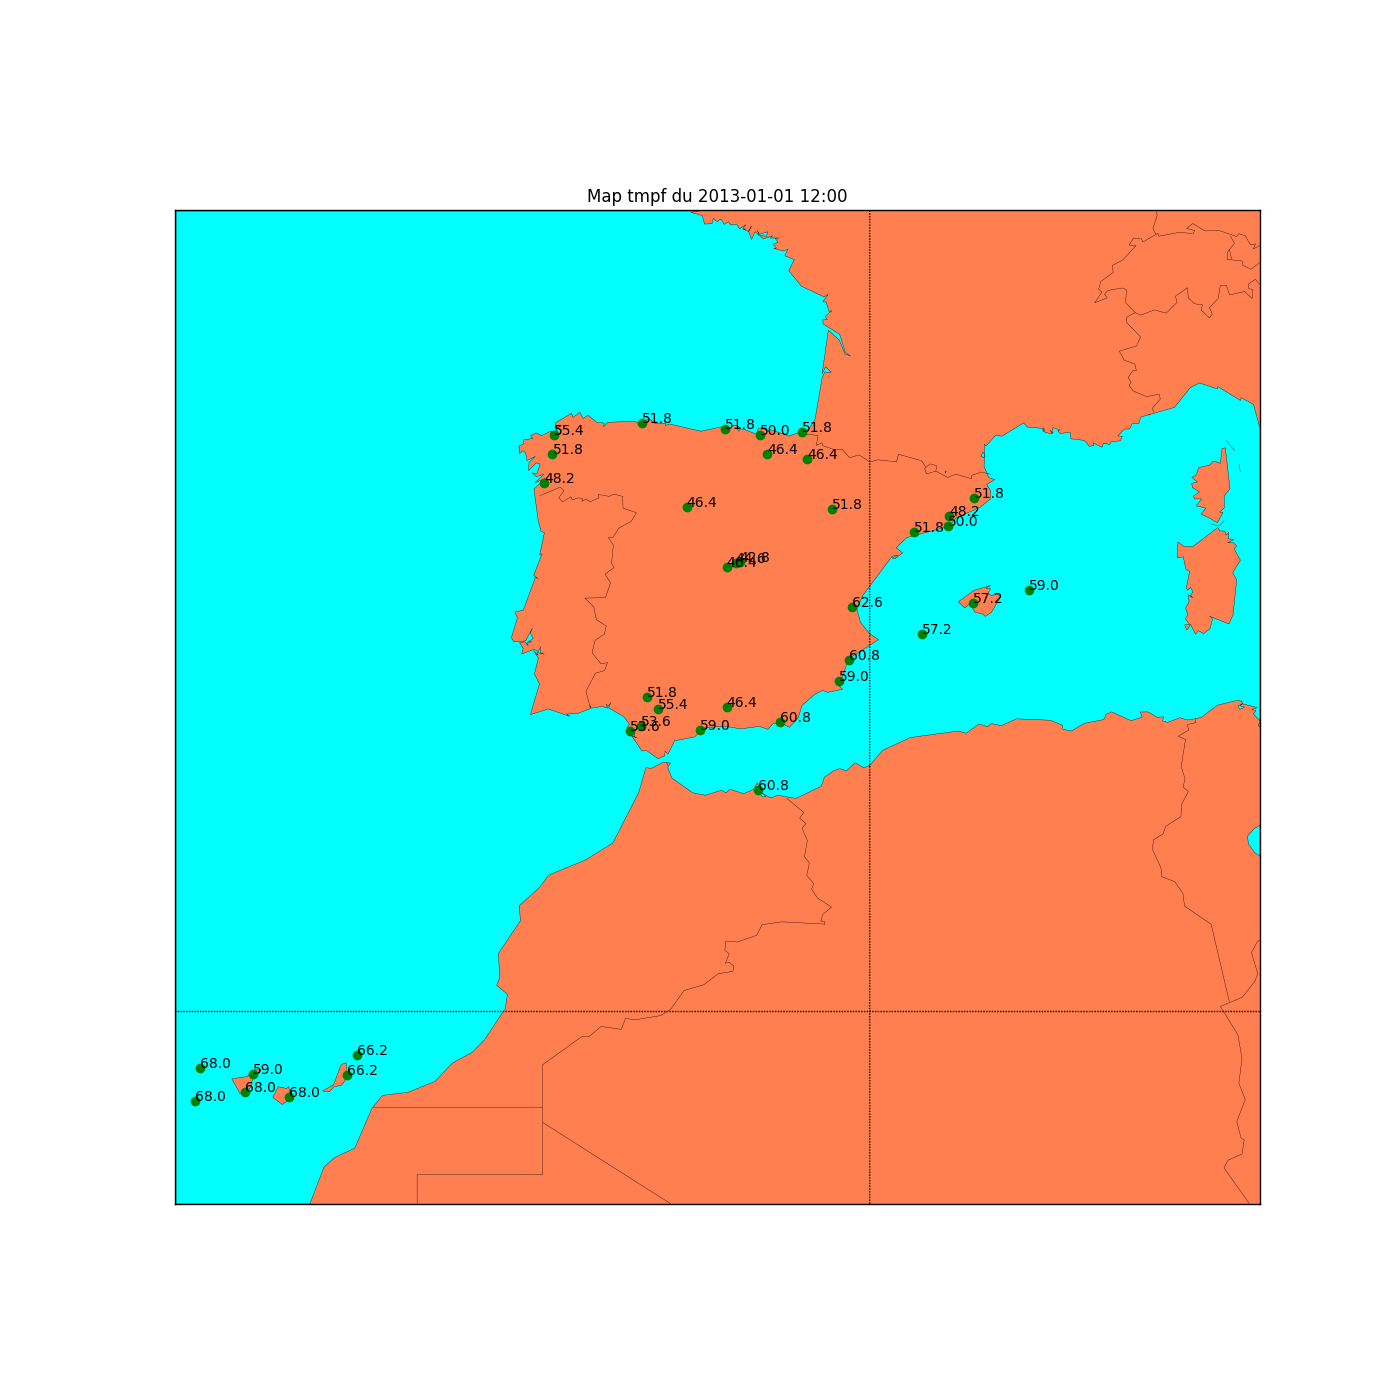 livrables/Rapport-LATEX/figures/map_tmpf_du_2013_01_01_12_00.png